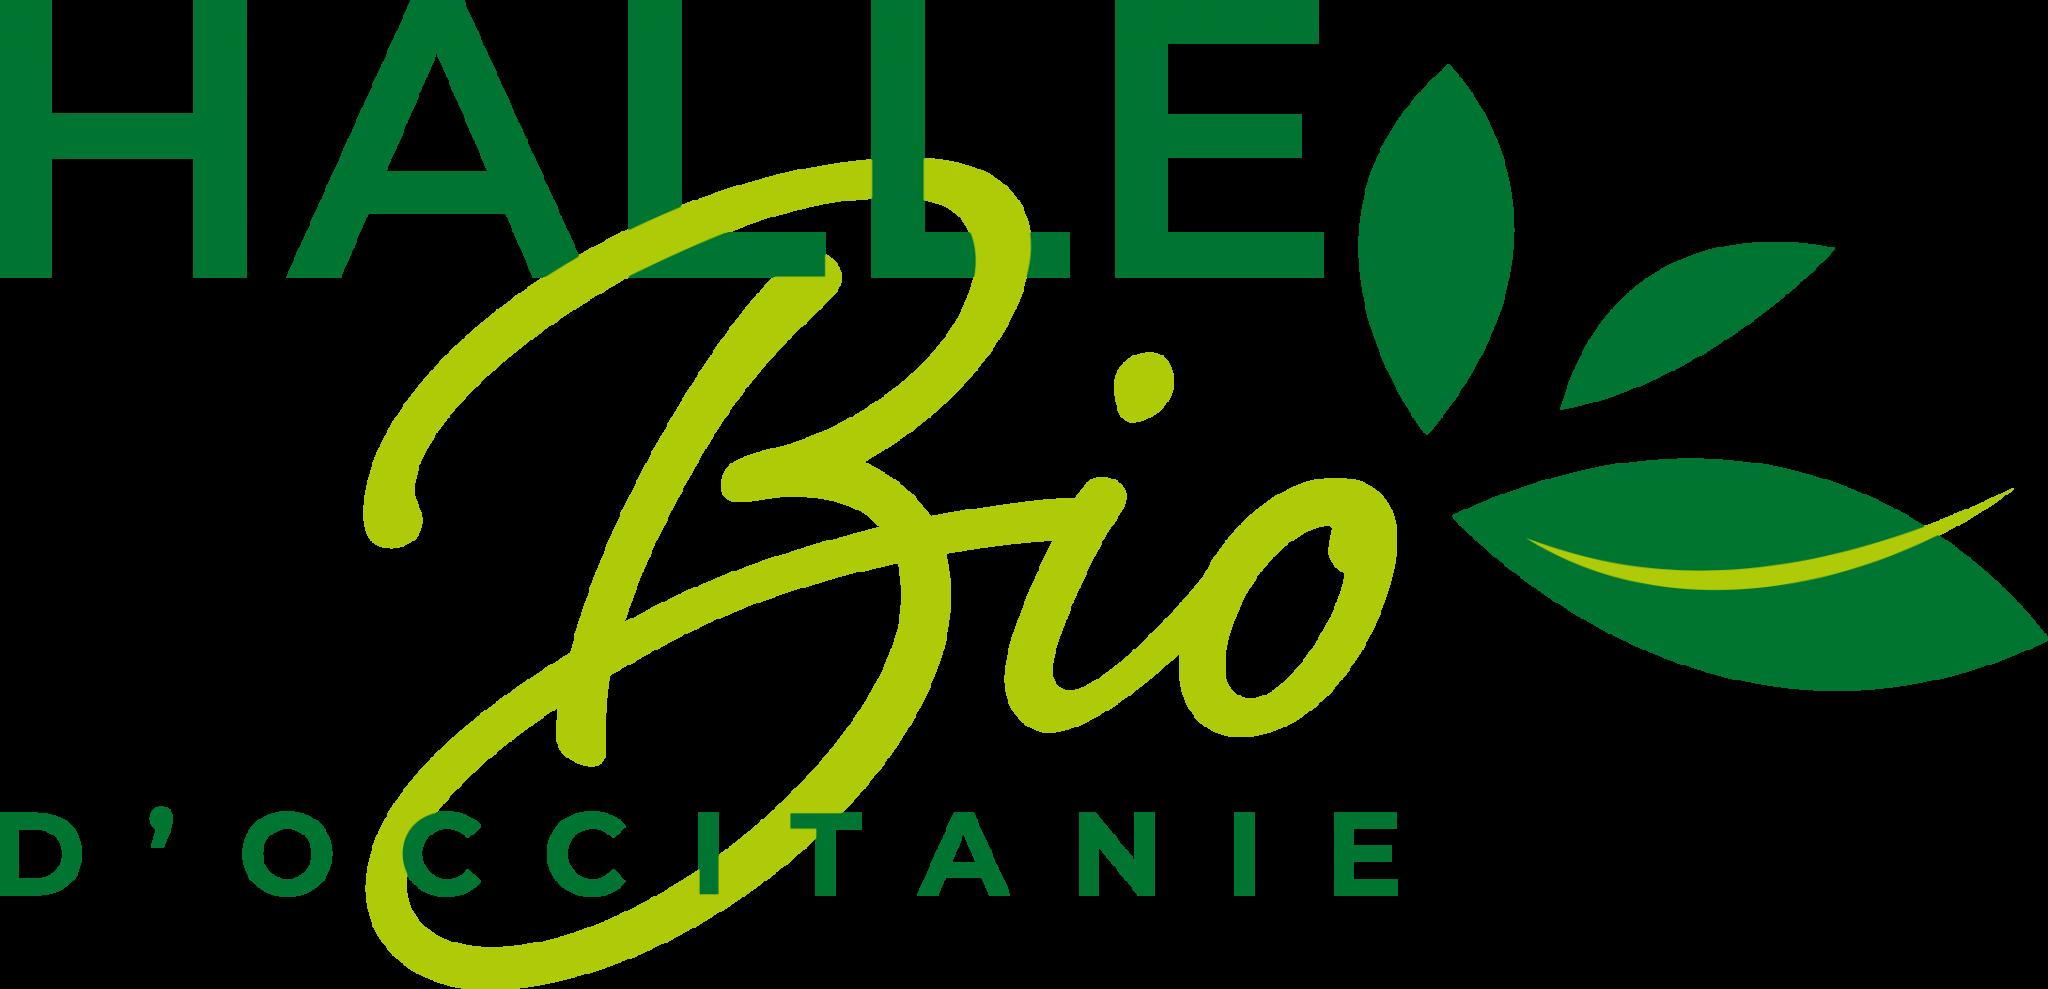 Halle bio d'Occitanie 8